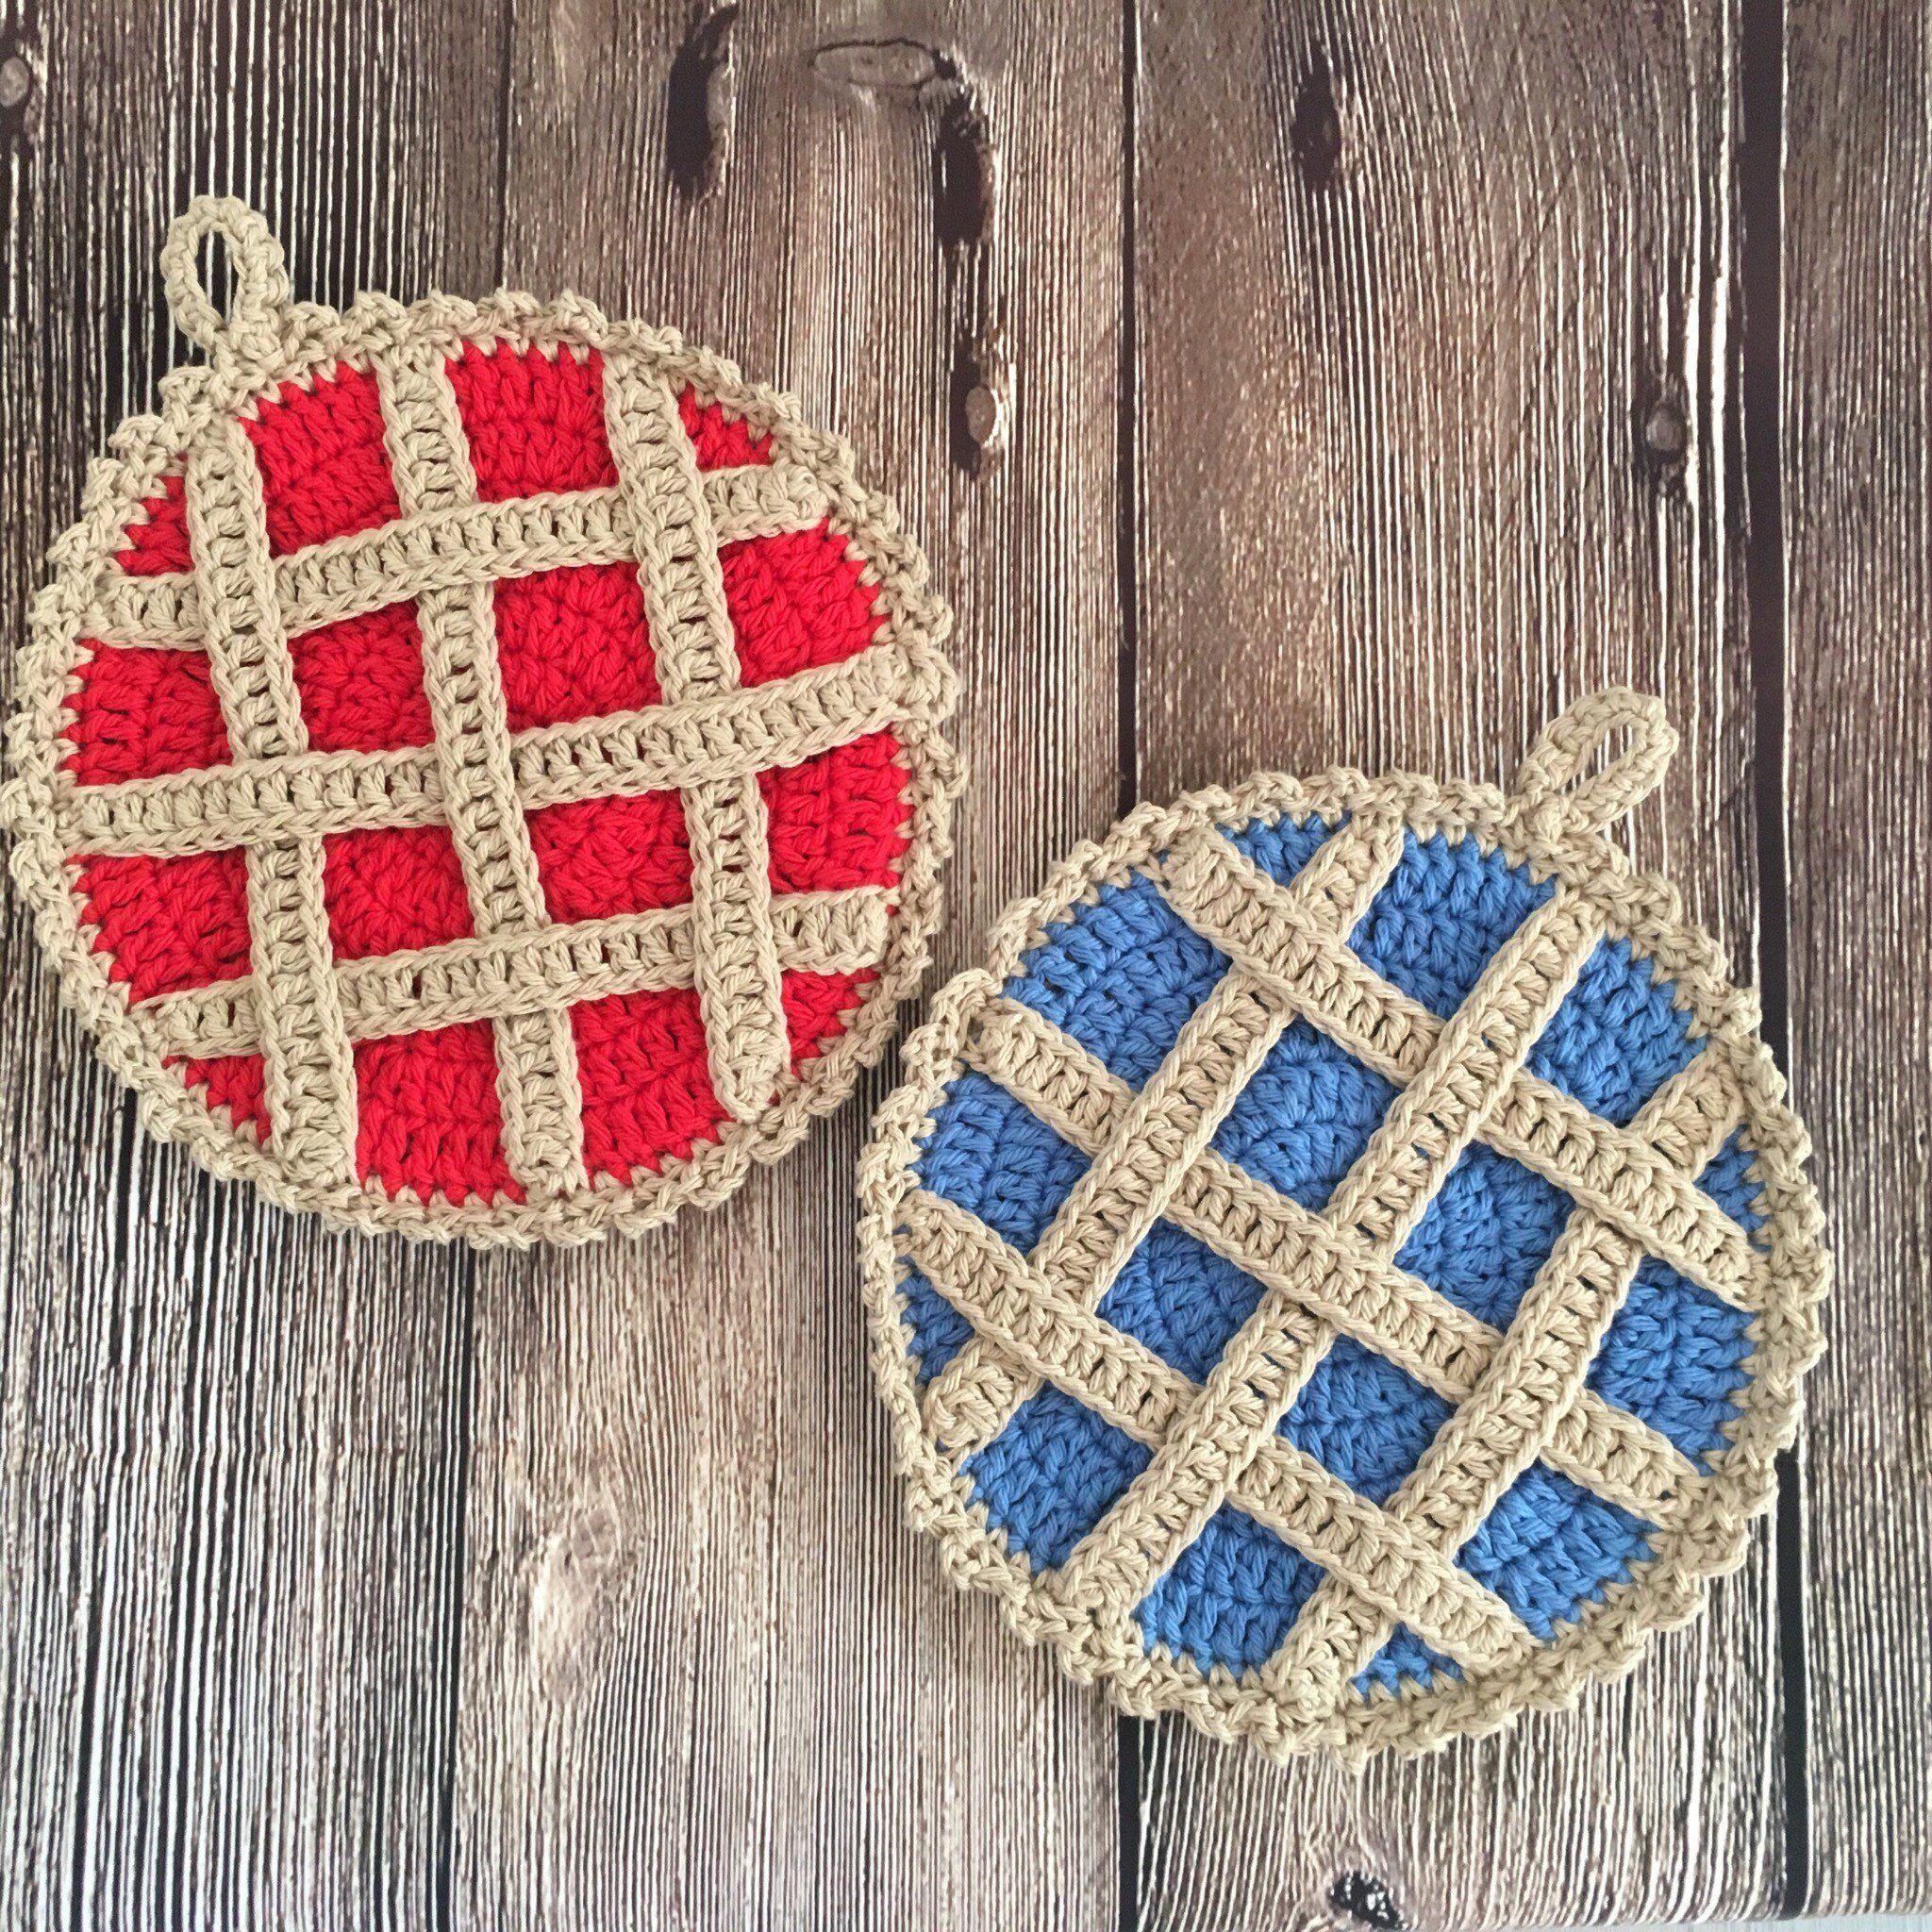 Crochet Pie Pot Holder Trivet In Cherry Pie And Blueberry Pie